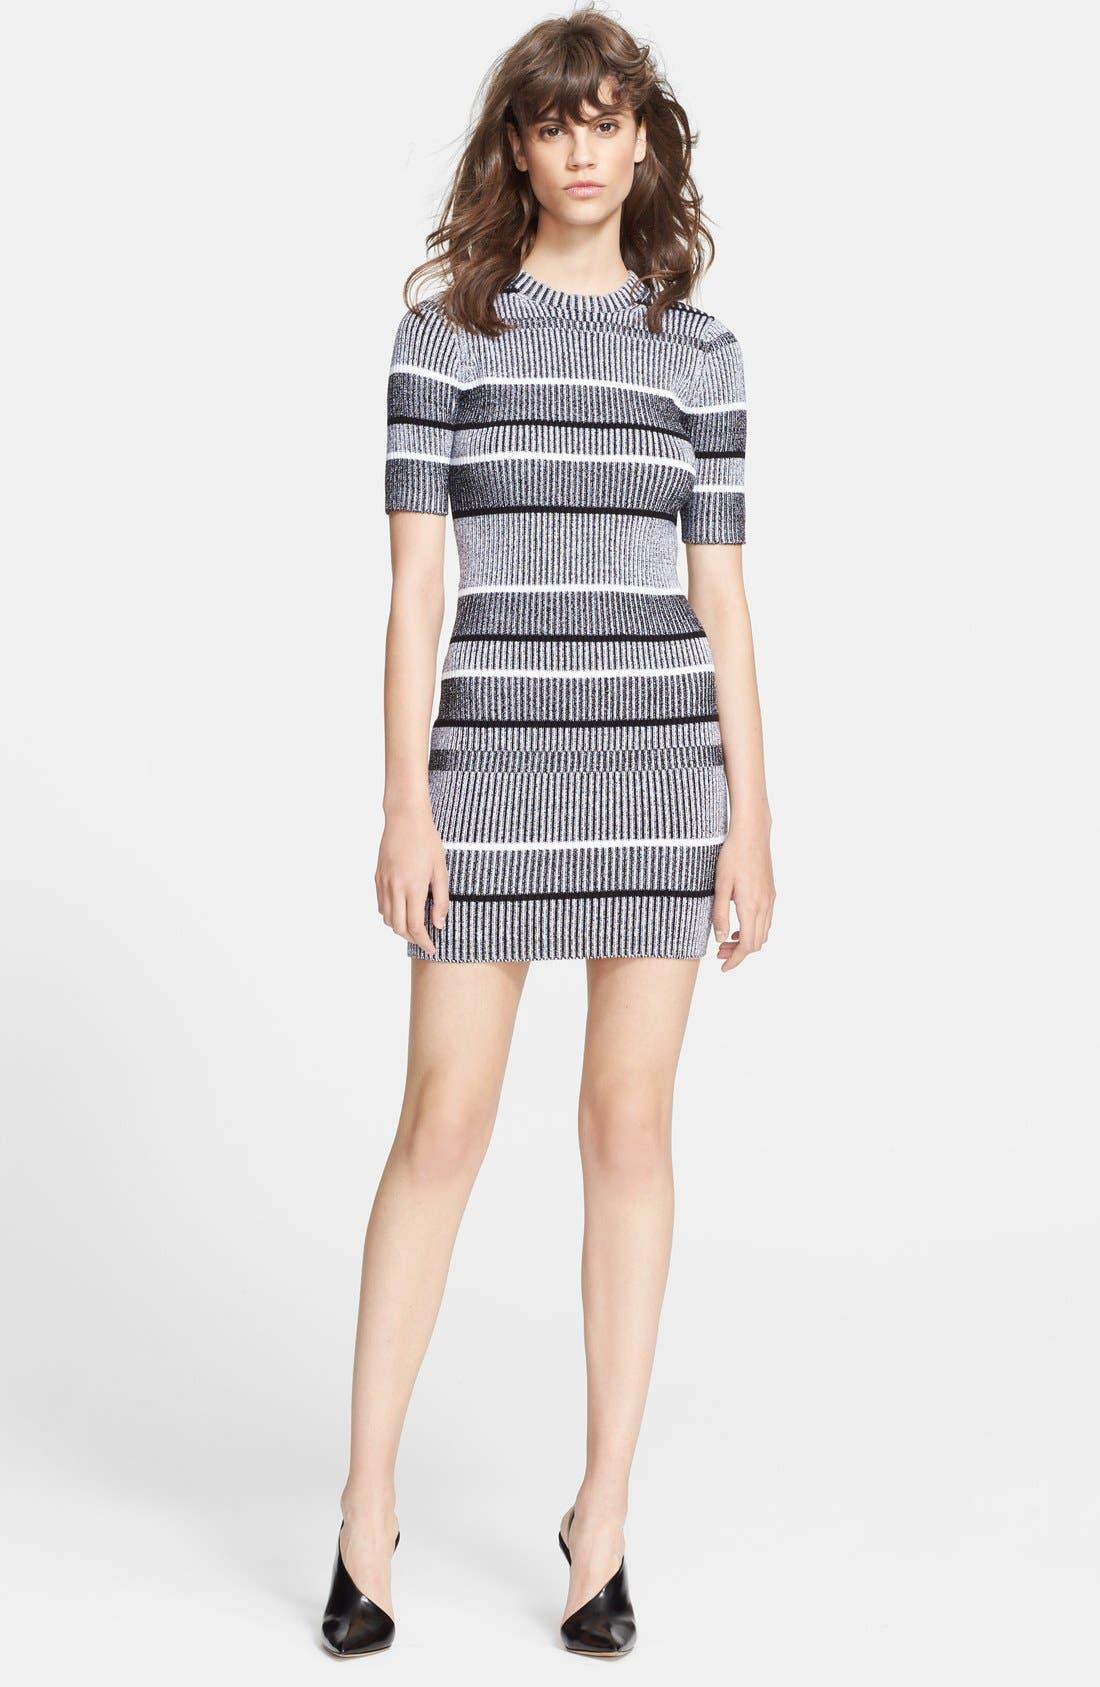 Alternate Image 1 Selected - Alexander Wang Stripe Rib Knit Sweater Dress